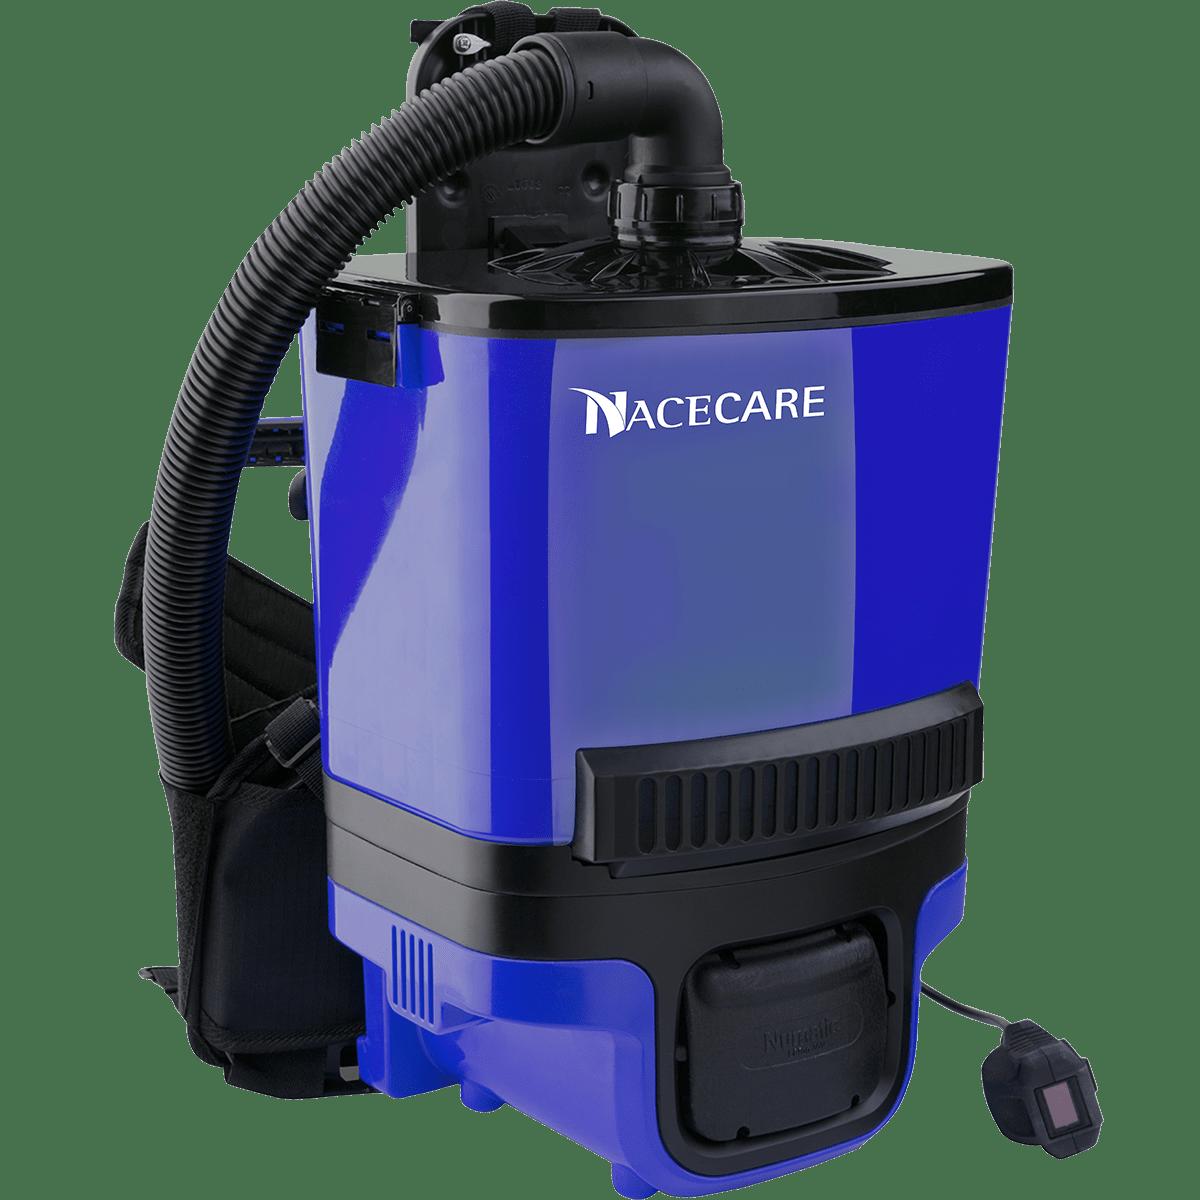 Nacecare Rbv130 Battery Backpack Vacuum Sylvane